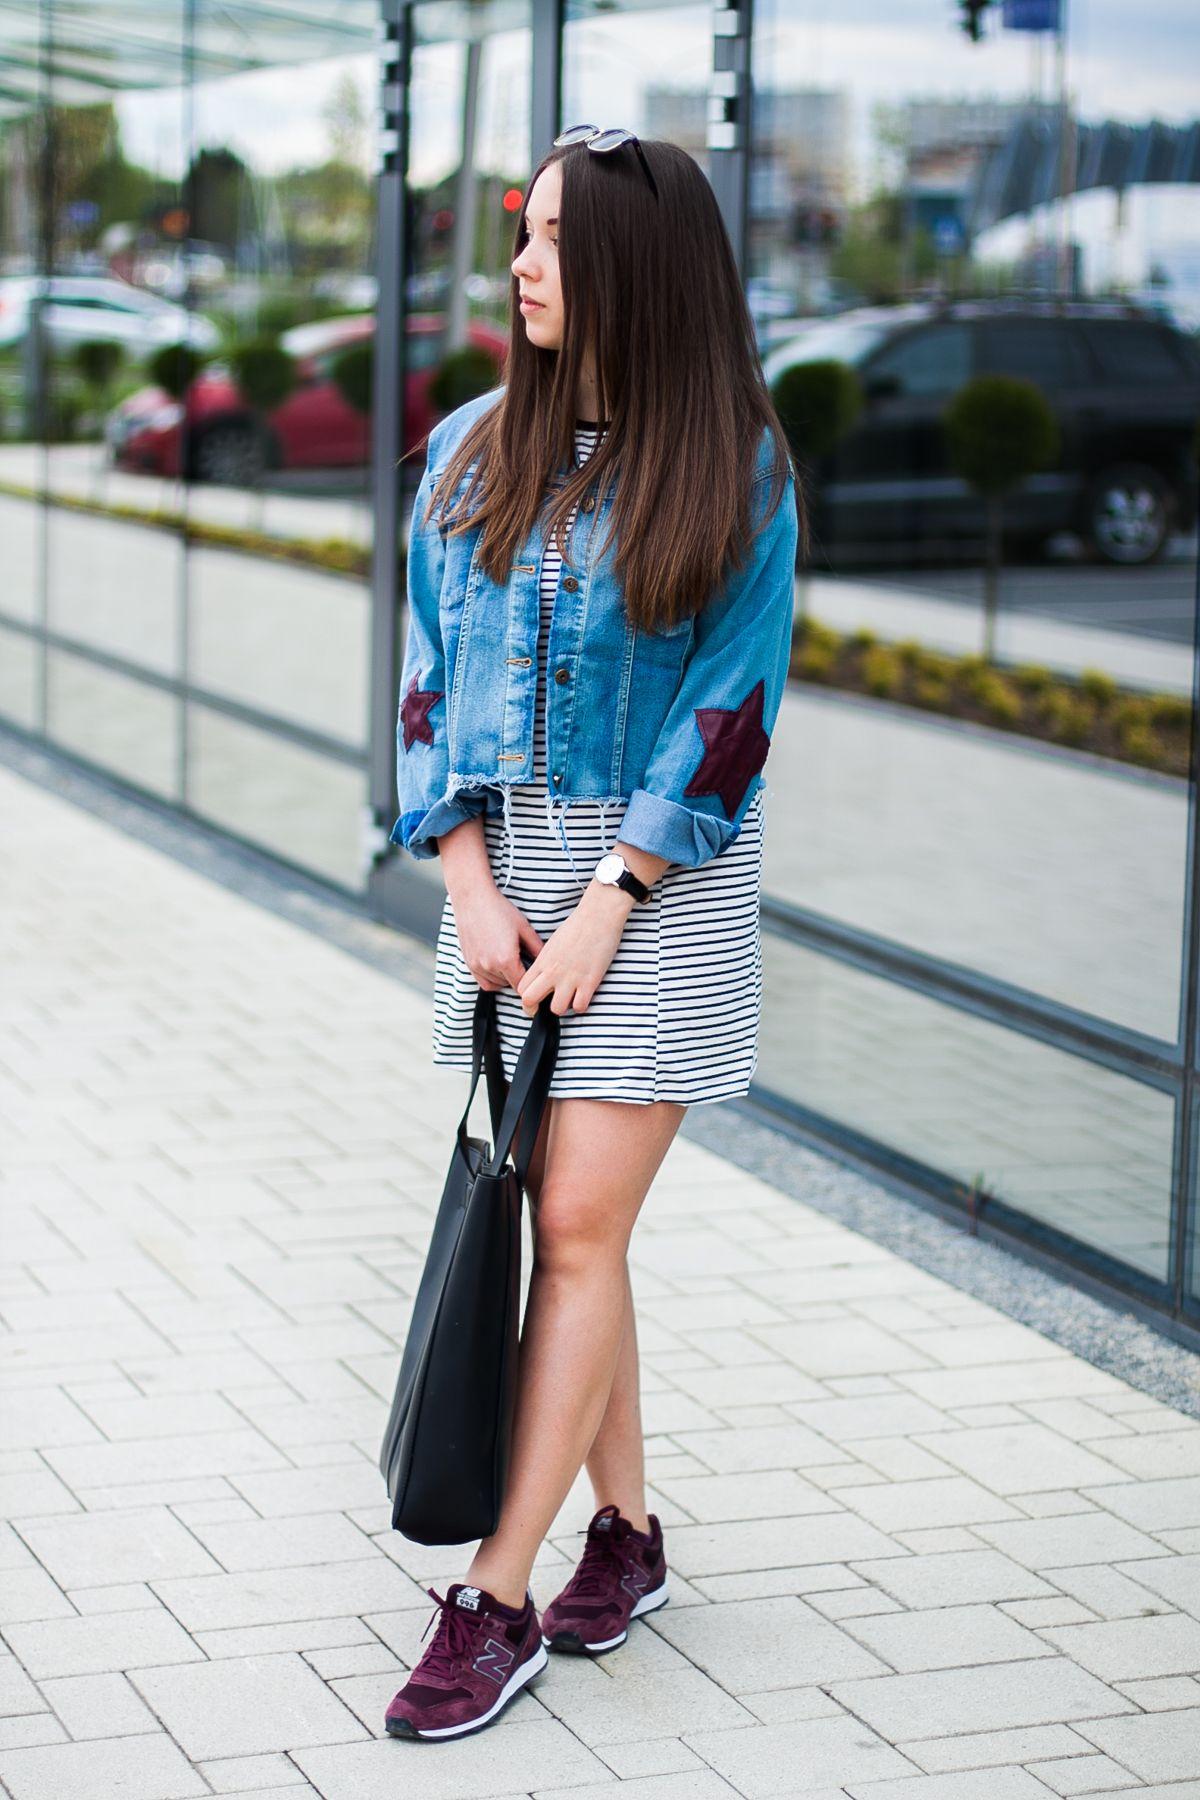 Sukienka W Paski I Buty New Balance 996 Fashion Summer Fashion Shirt Dress